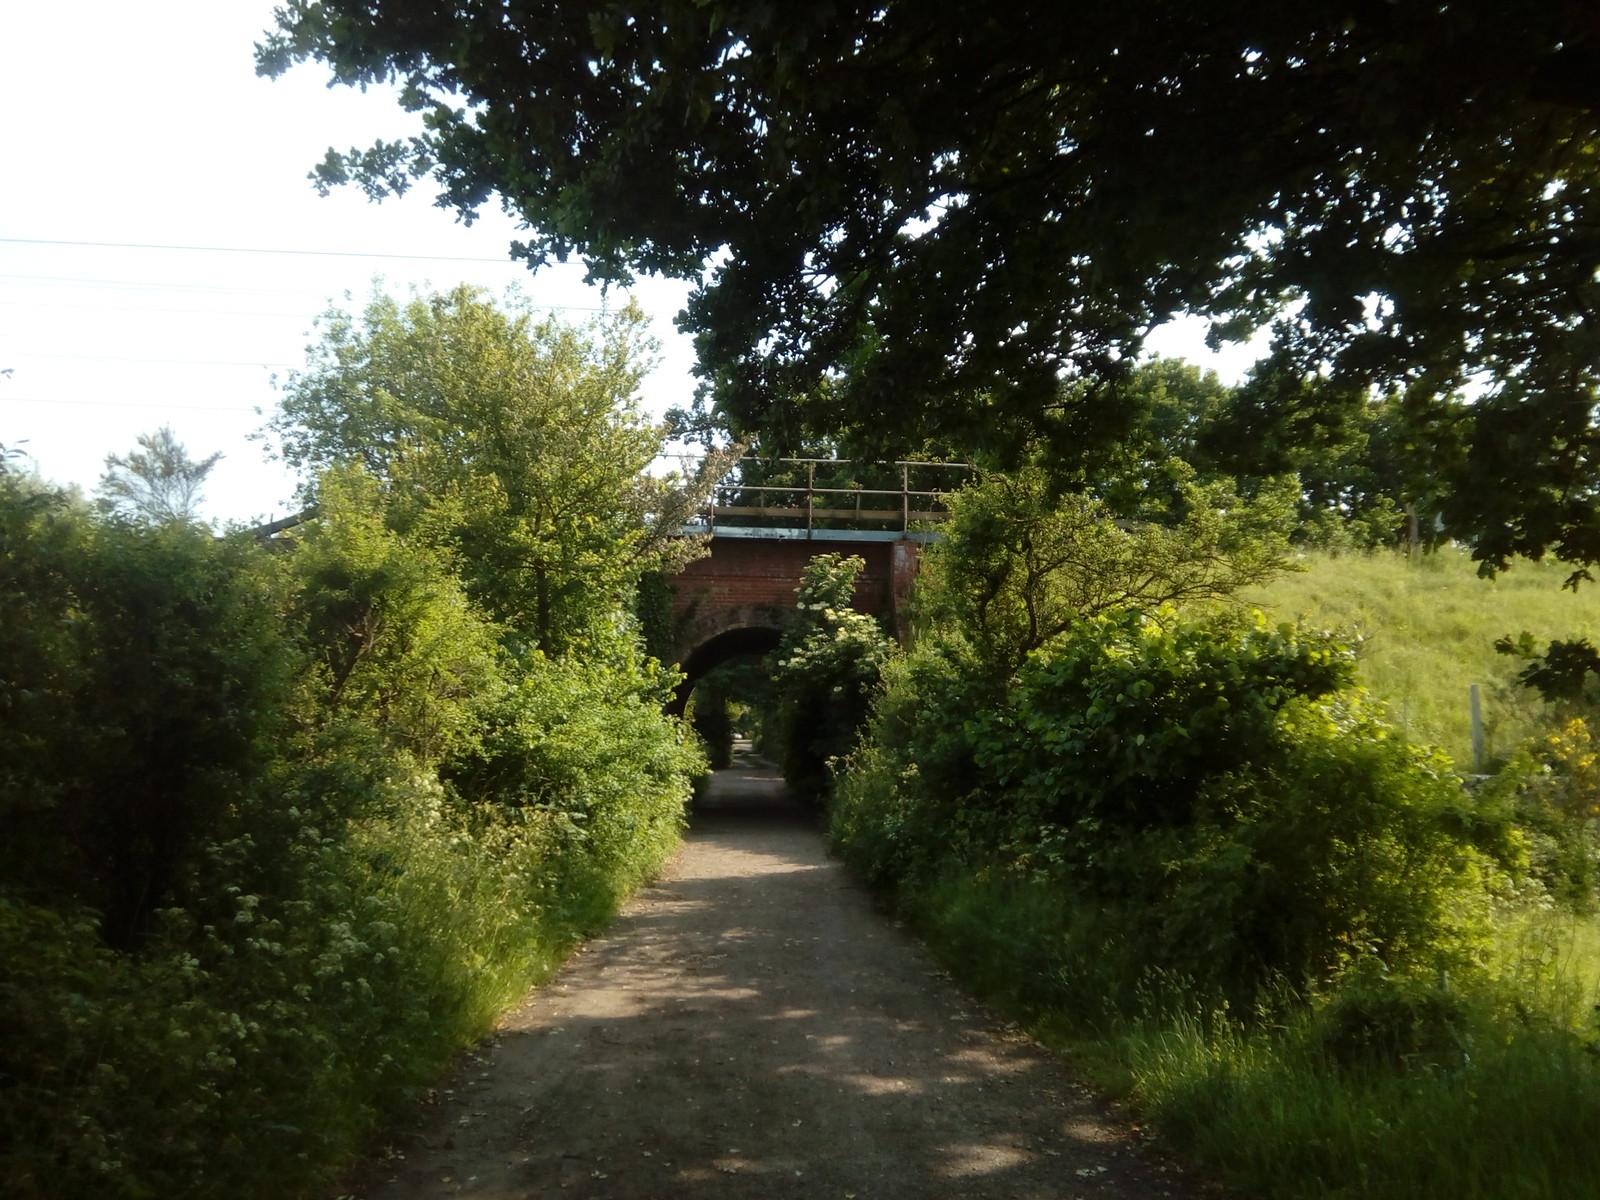 Railway bridge before Manningtree Station Softened by the vigorous growth along the roadside embankment